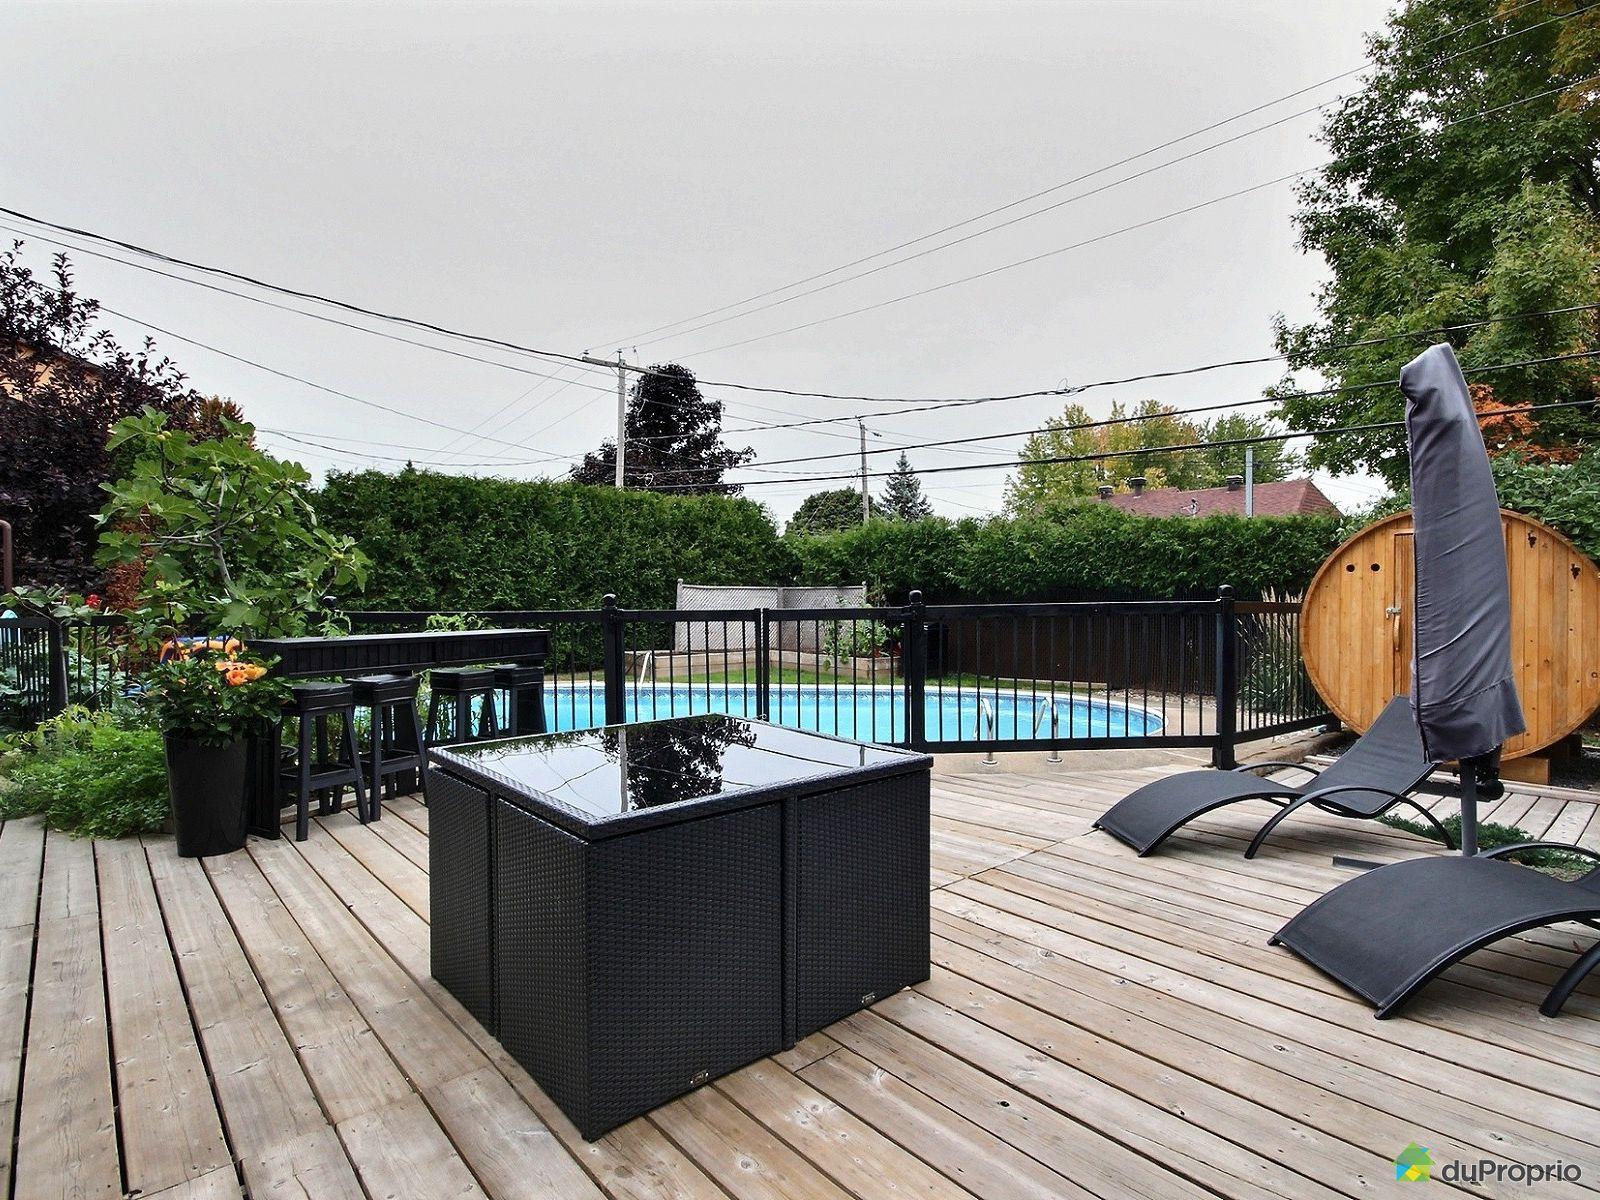 Maison vendre terrebonne 805 rue de bourg louis for Piscine terrebonne